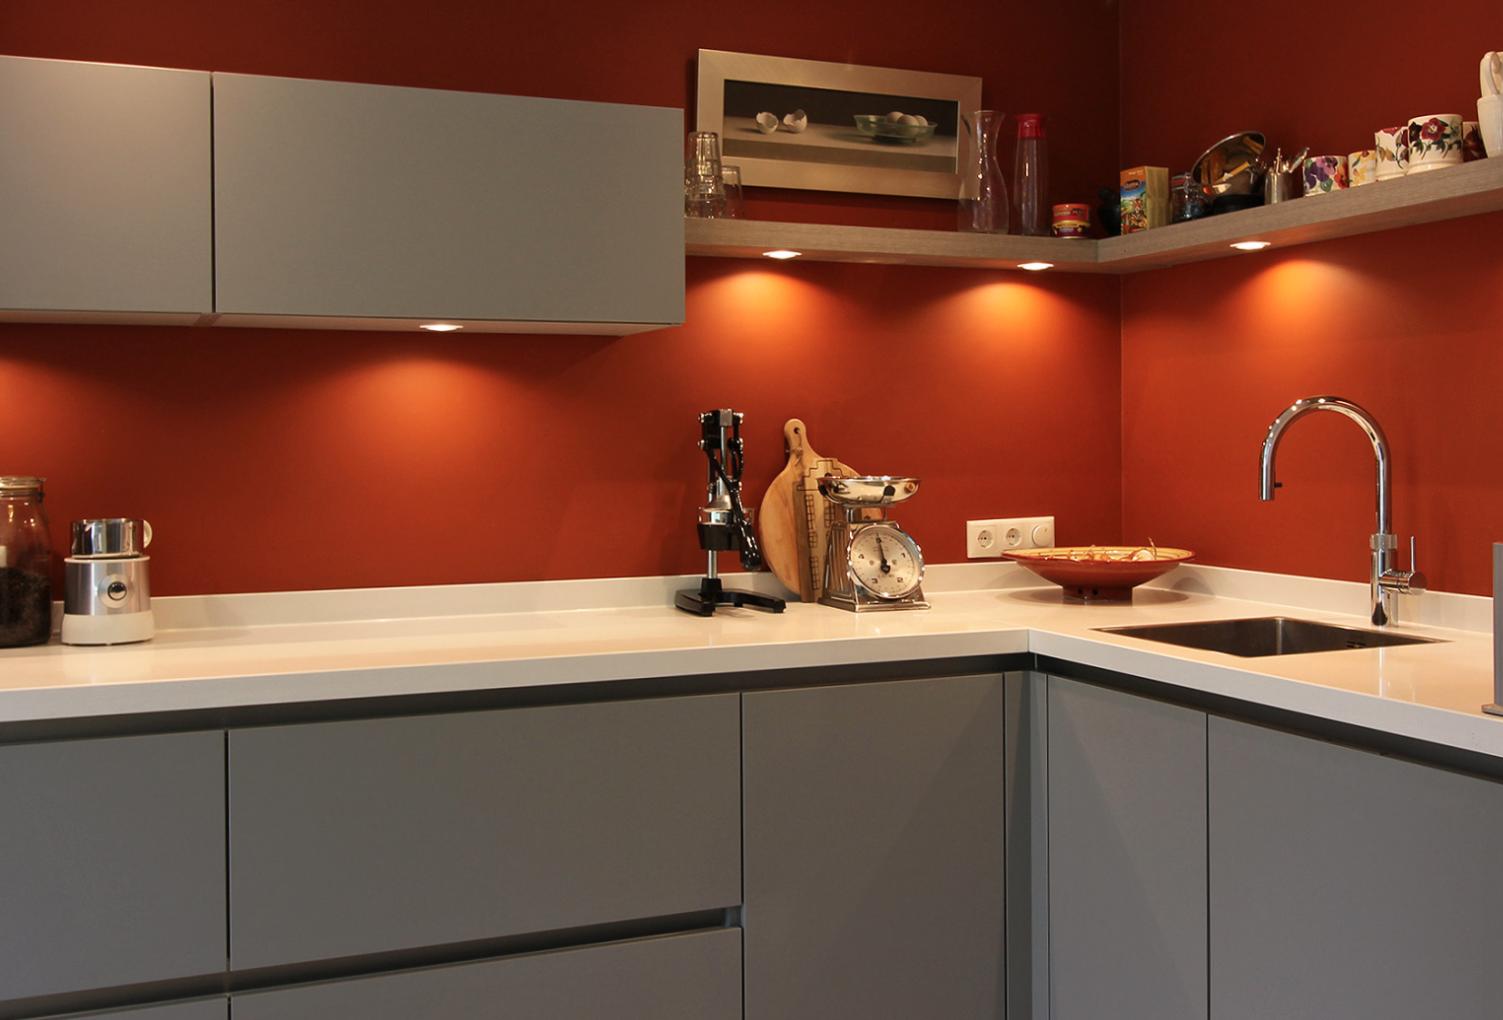 Moderne Lichtgrijze Keuken Met Wit Glanzend Werkblad En Rode Achterwand Hoekkeukens Keuken Keuken Op Maat Moderne Keukens